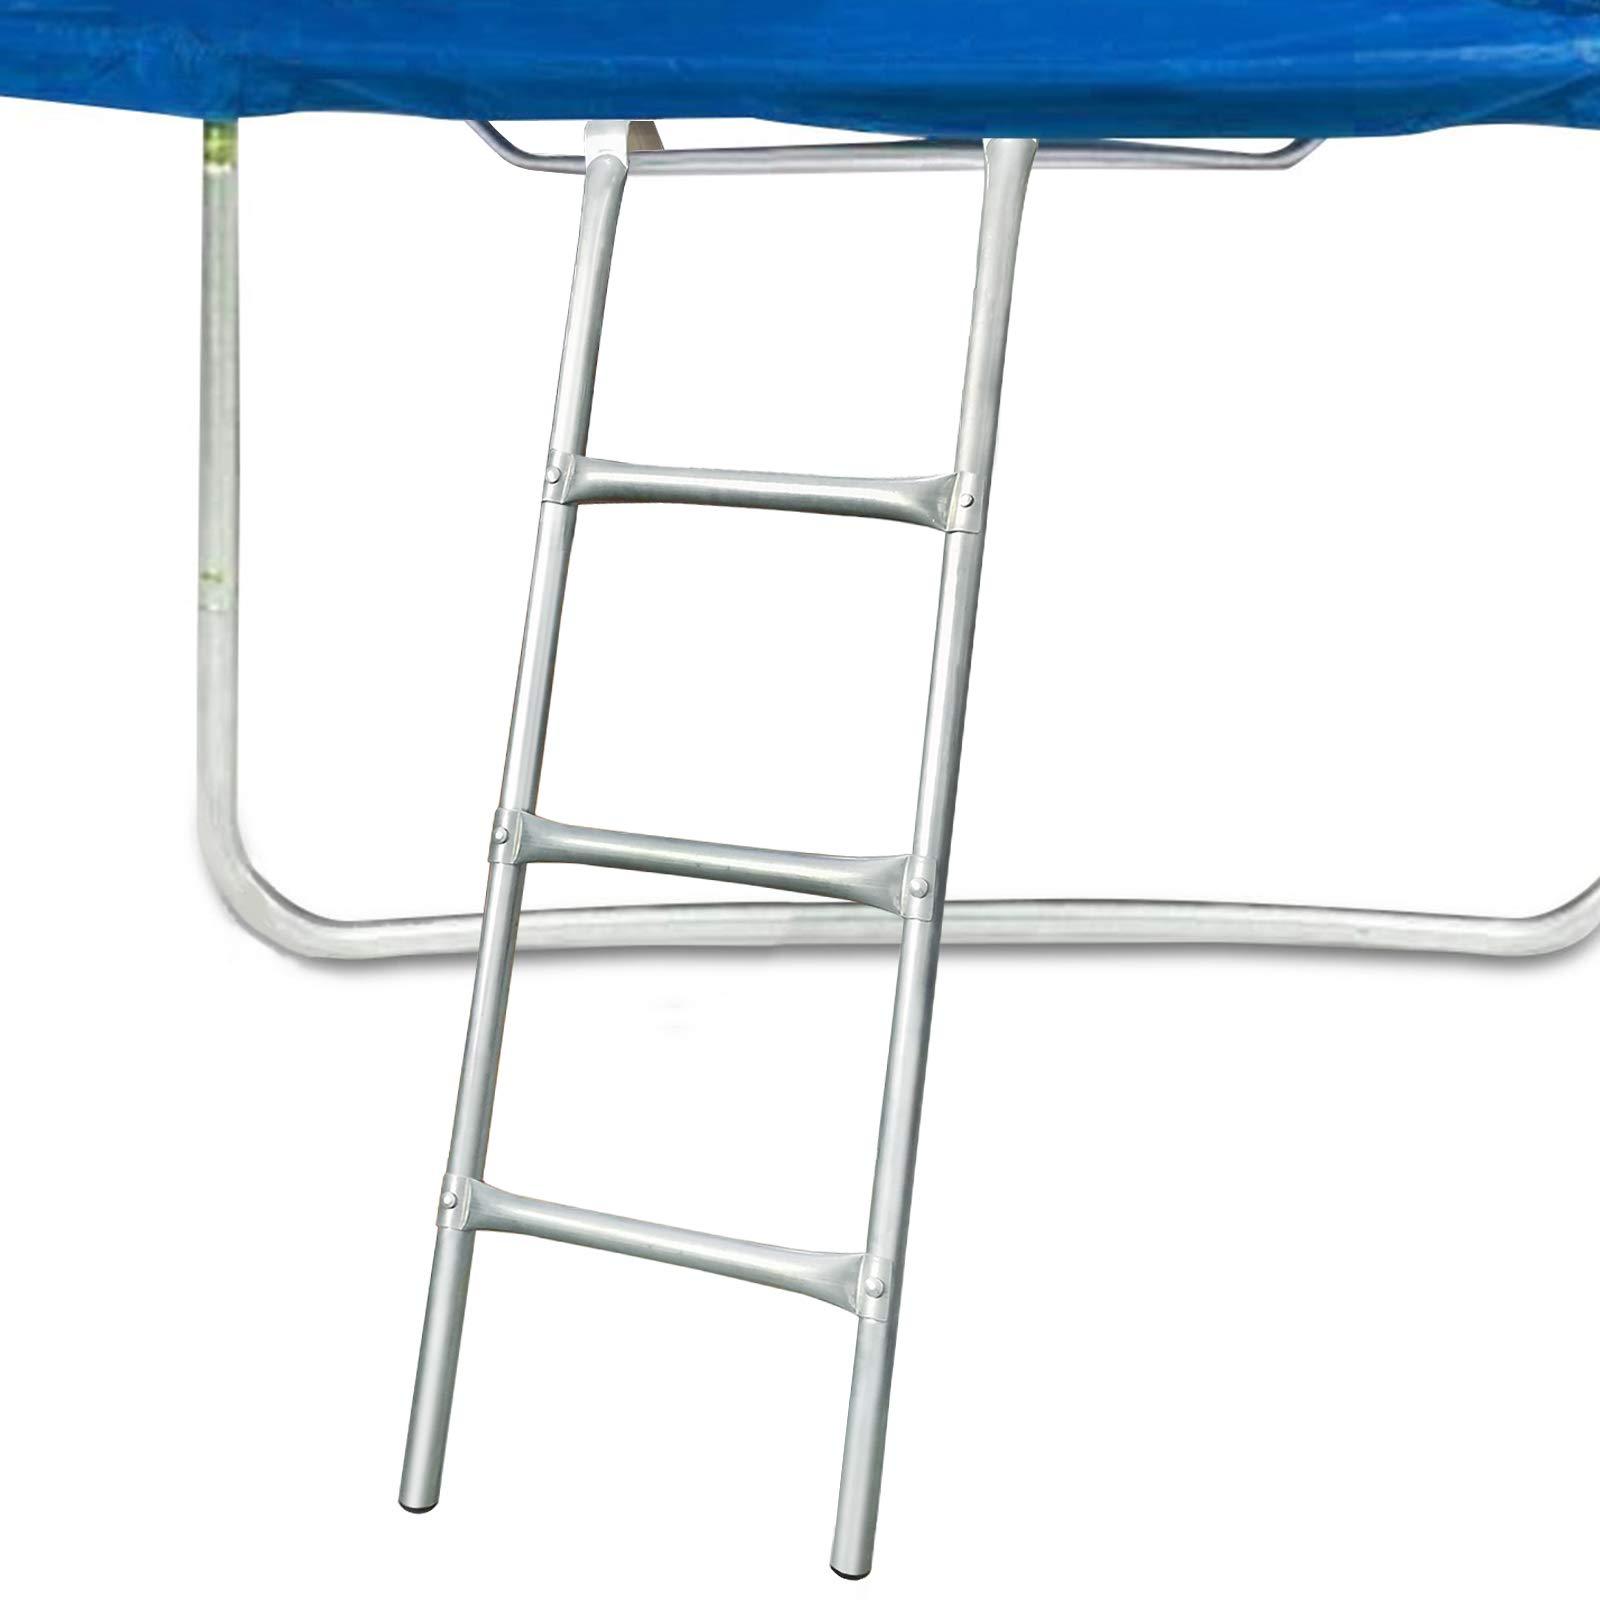 Cootway Trampoline Ladder, 3-Step Universal Trampoline Ladder Accessories for Children Kids, Easy to Install, Sturdy and Safe, Weather Resistant Galvanized Steel Ladder